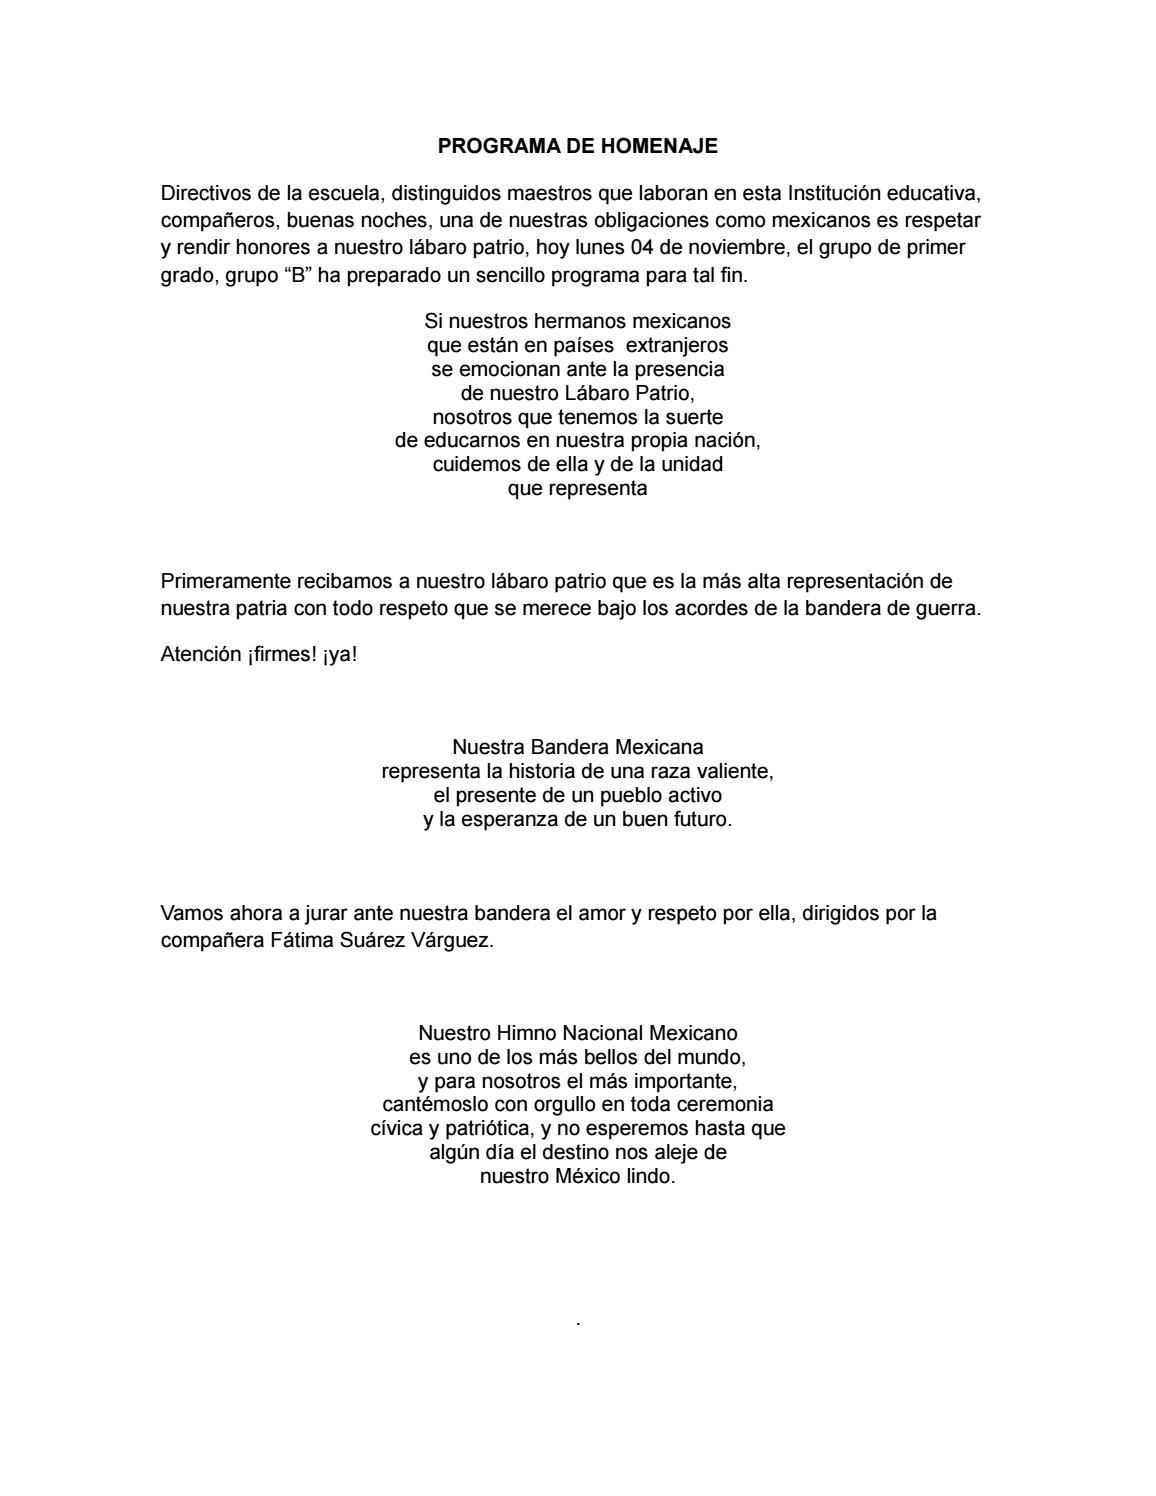 ÉTICA Y VALORES by Hector Manuel Uicab Ceh - issuu